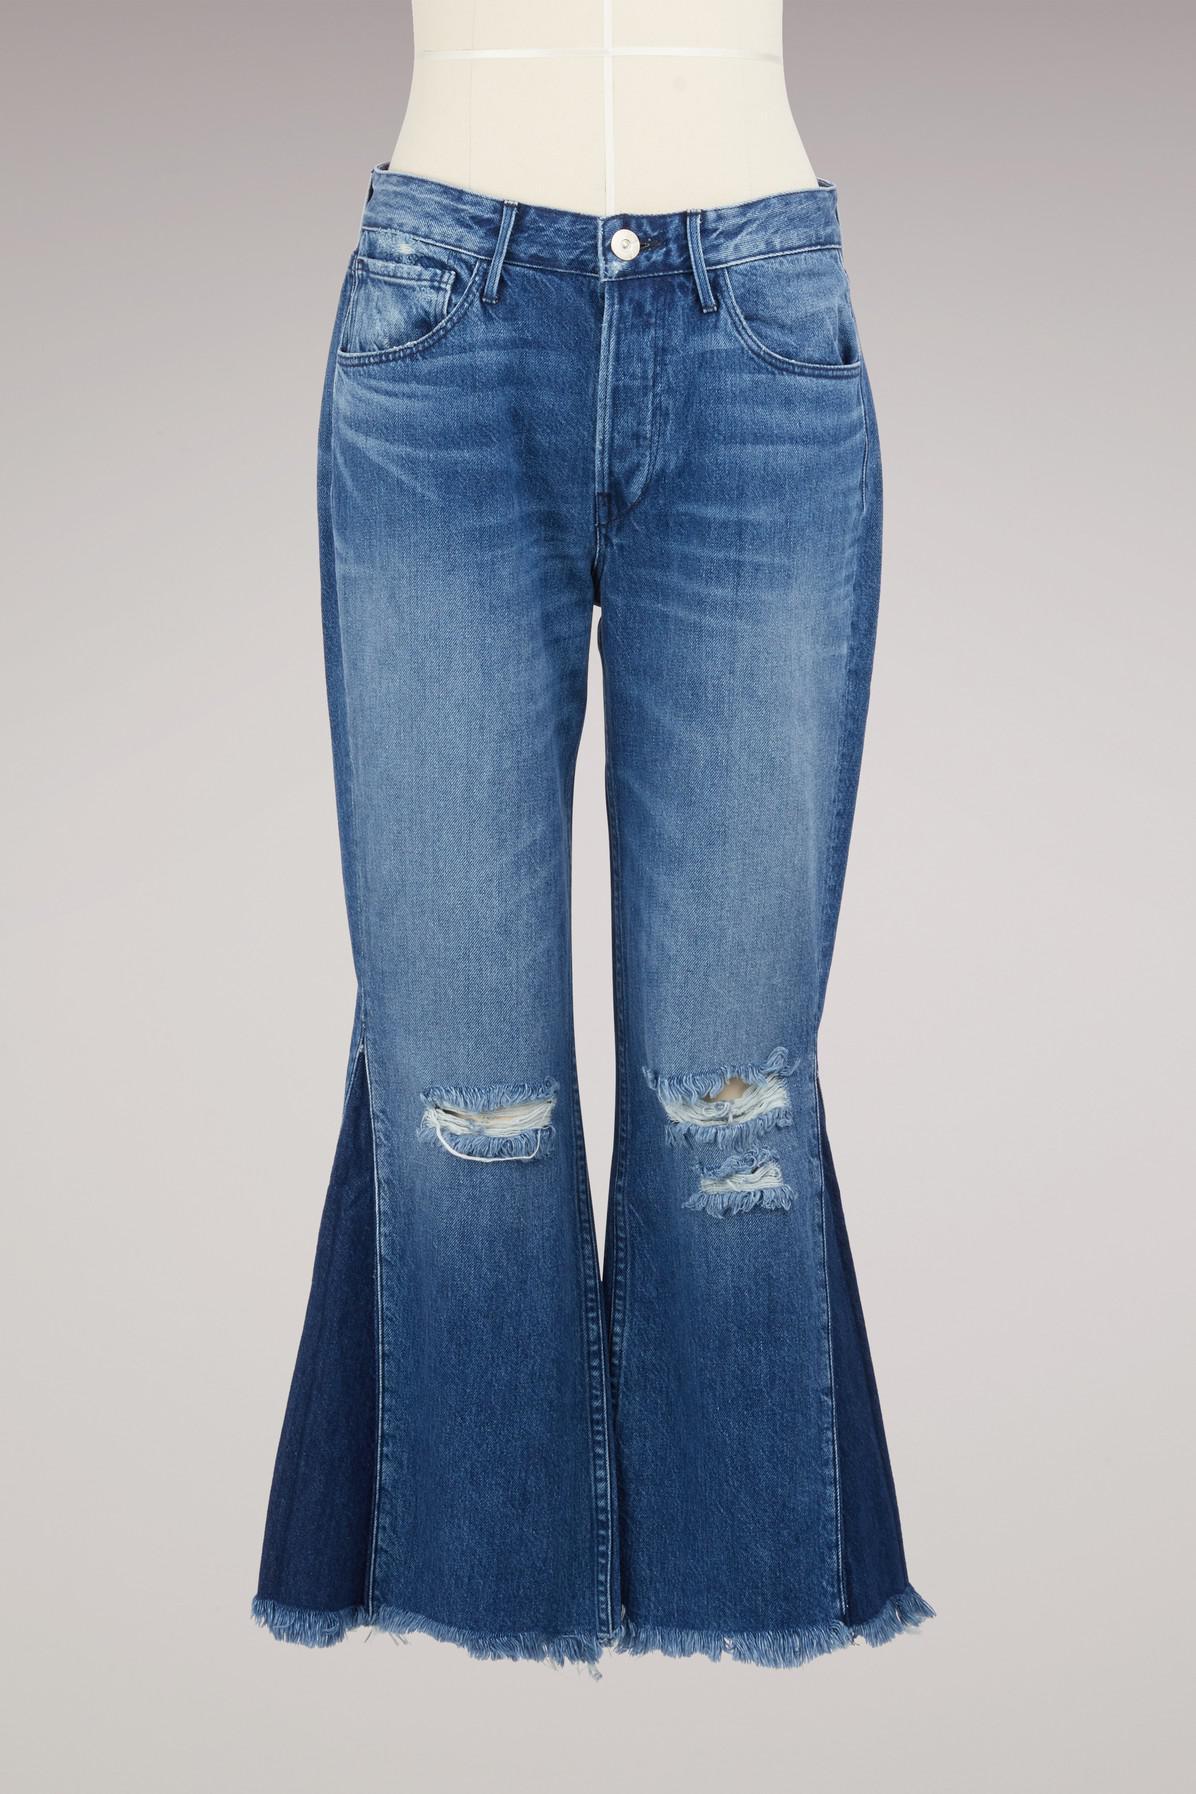 W4 Higher Ground Gusset Crop jeans - Blue 3x1 lN3CNhE